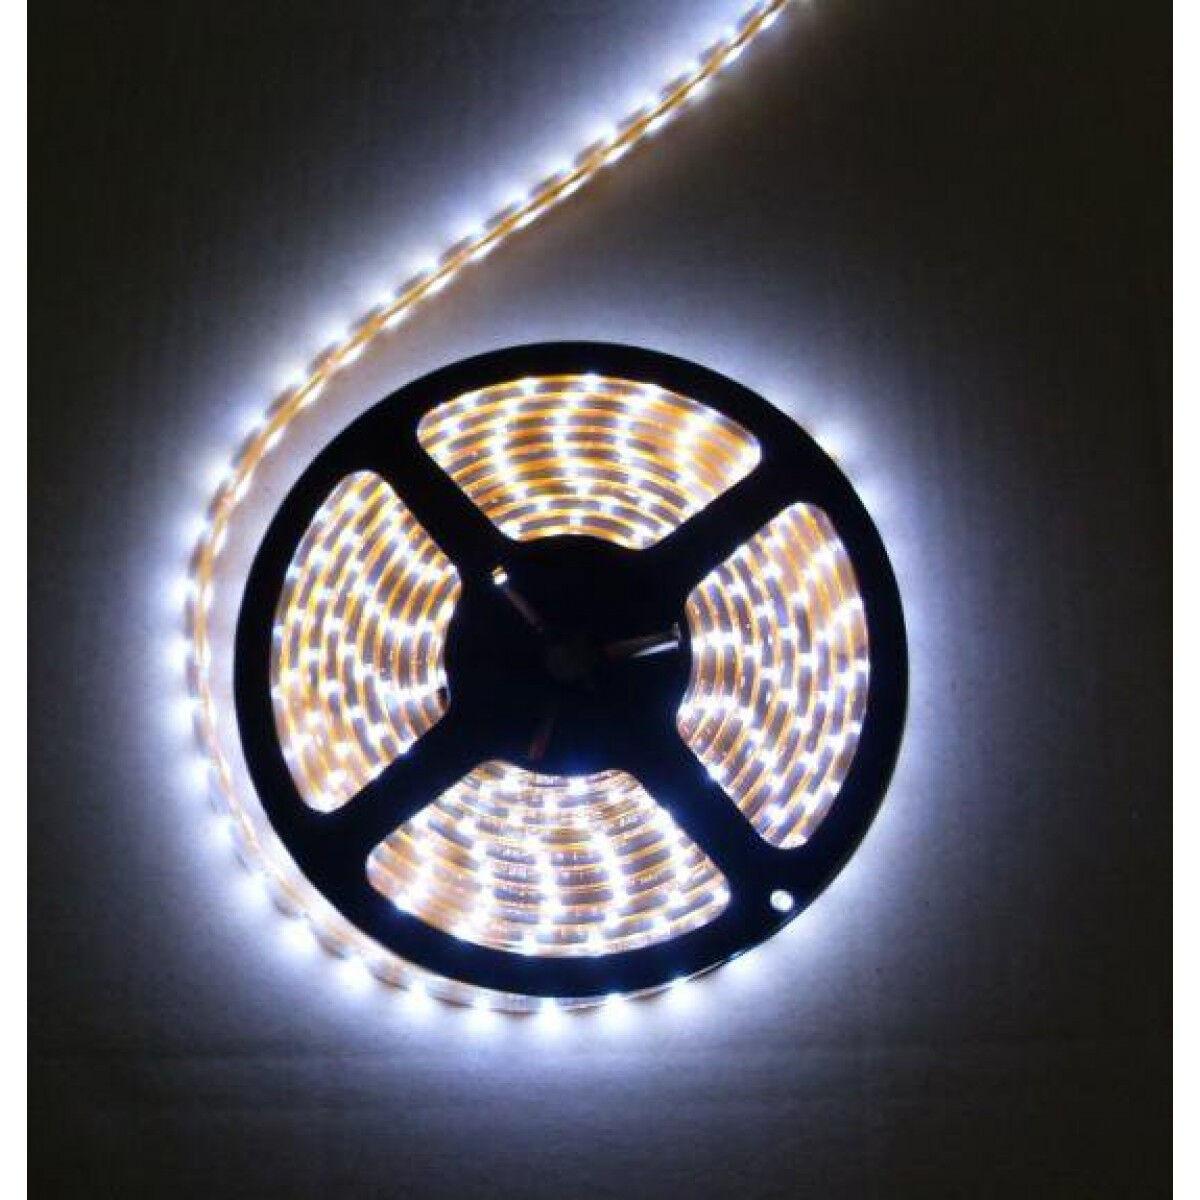 Saltwater Aquarium Reef Coral Weiß 14000K Light Light Light LED Strip 250 Lumens Ft 14 000k 3e2dd9